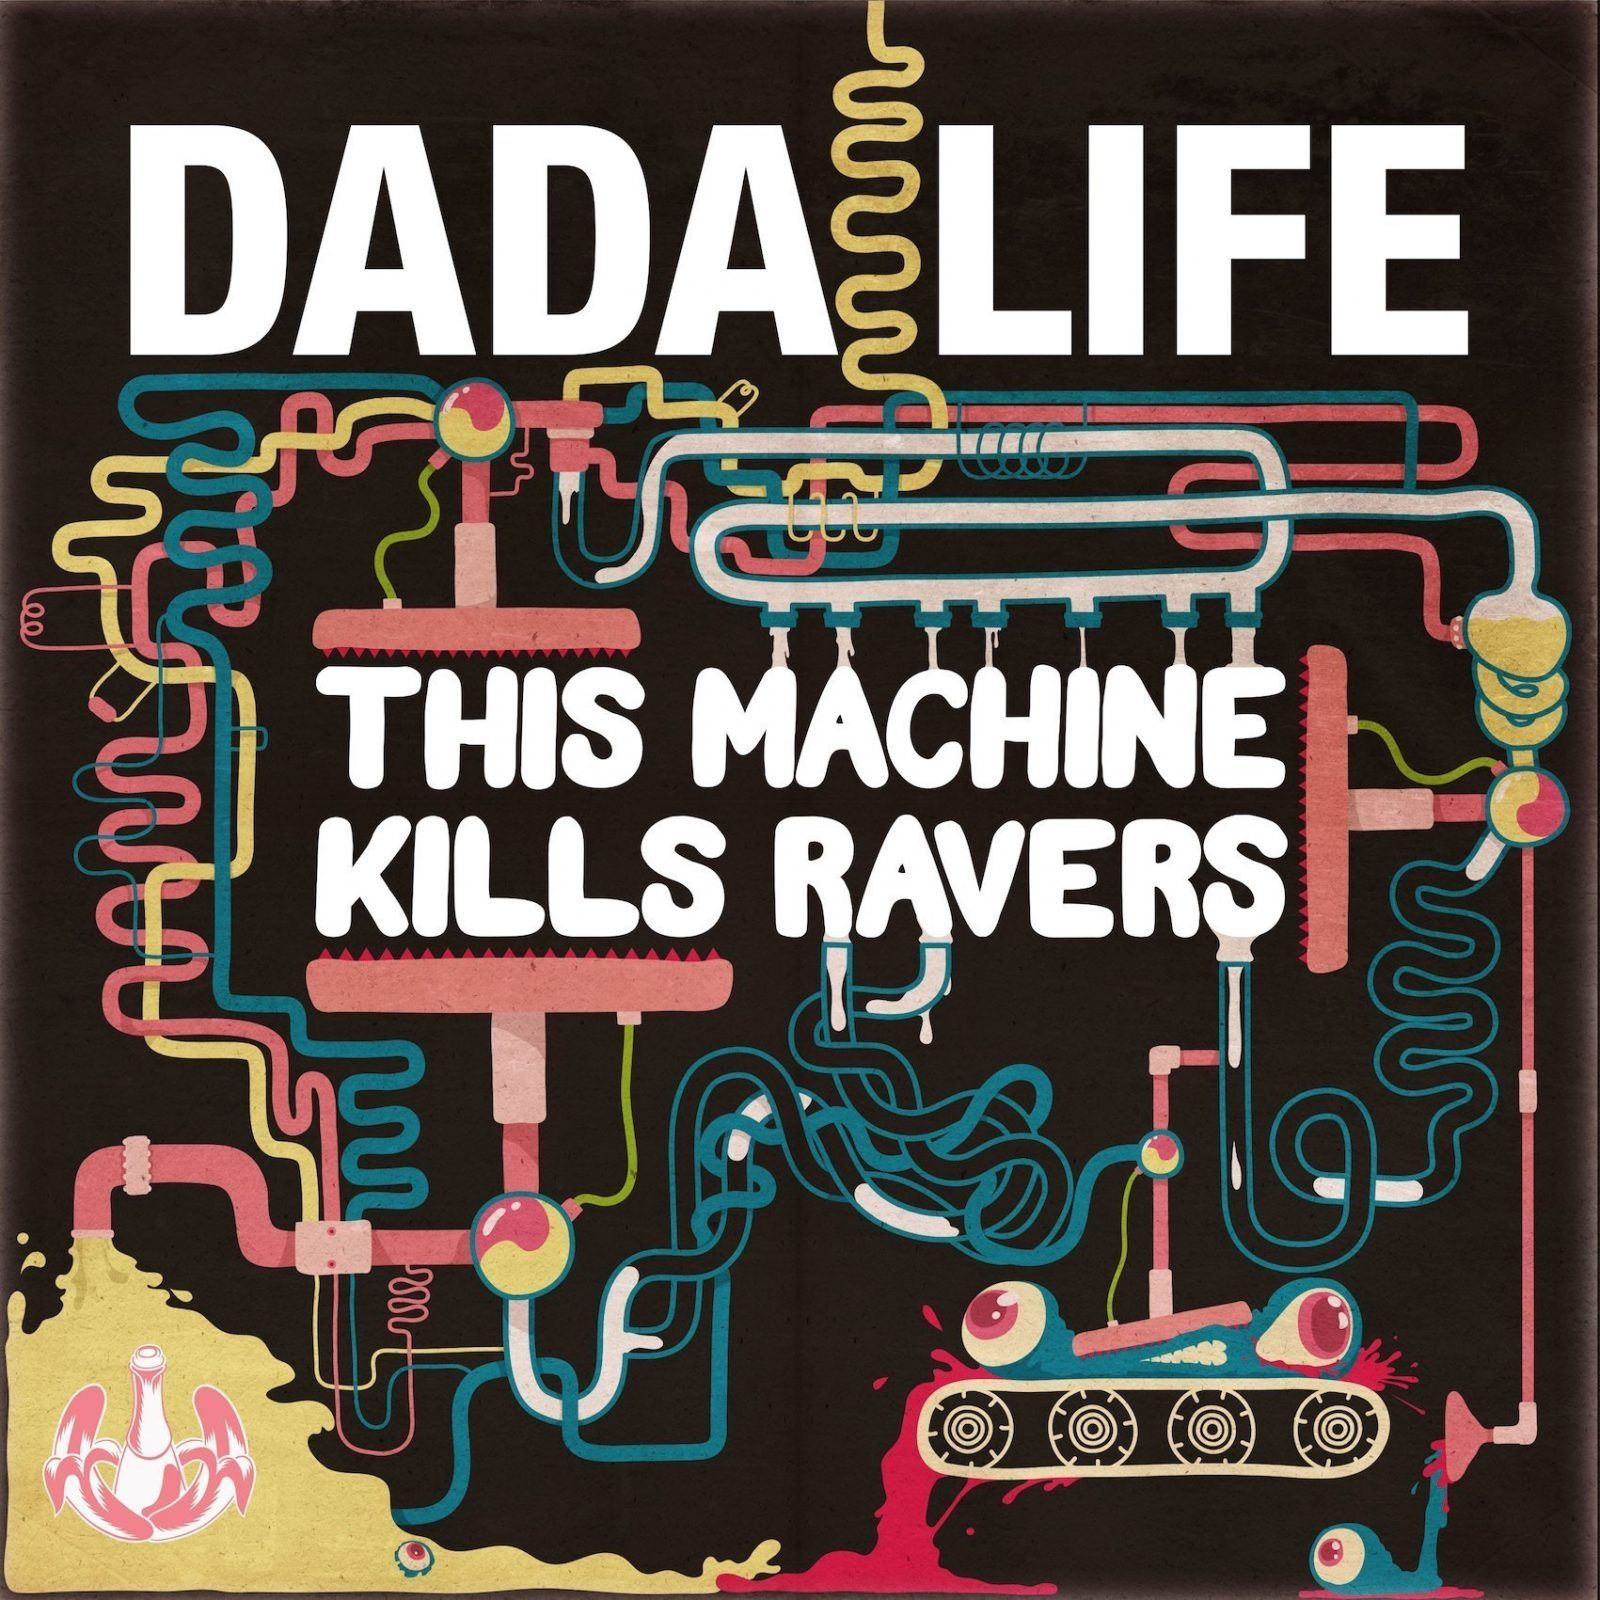 machine-kills-ravers-final1-1.jpeg